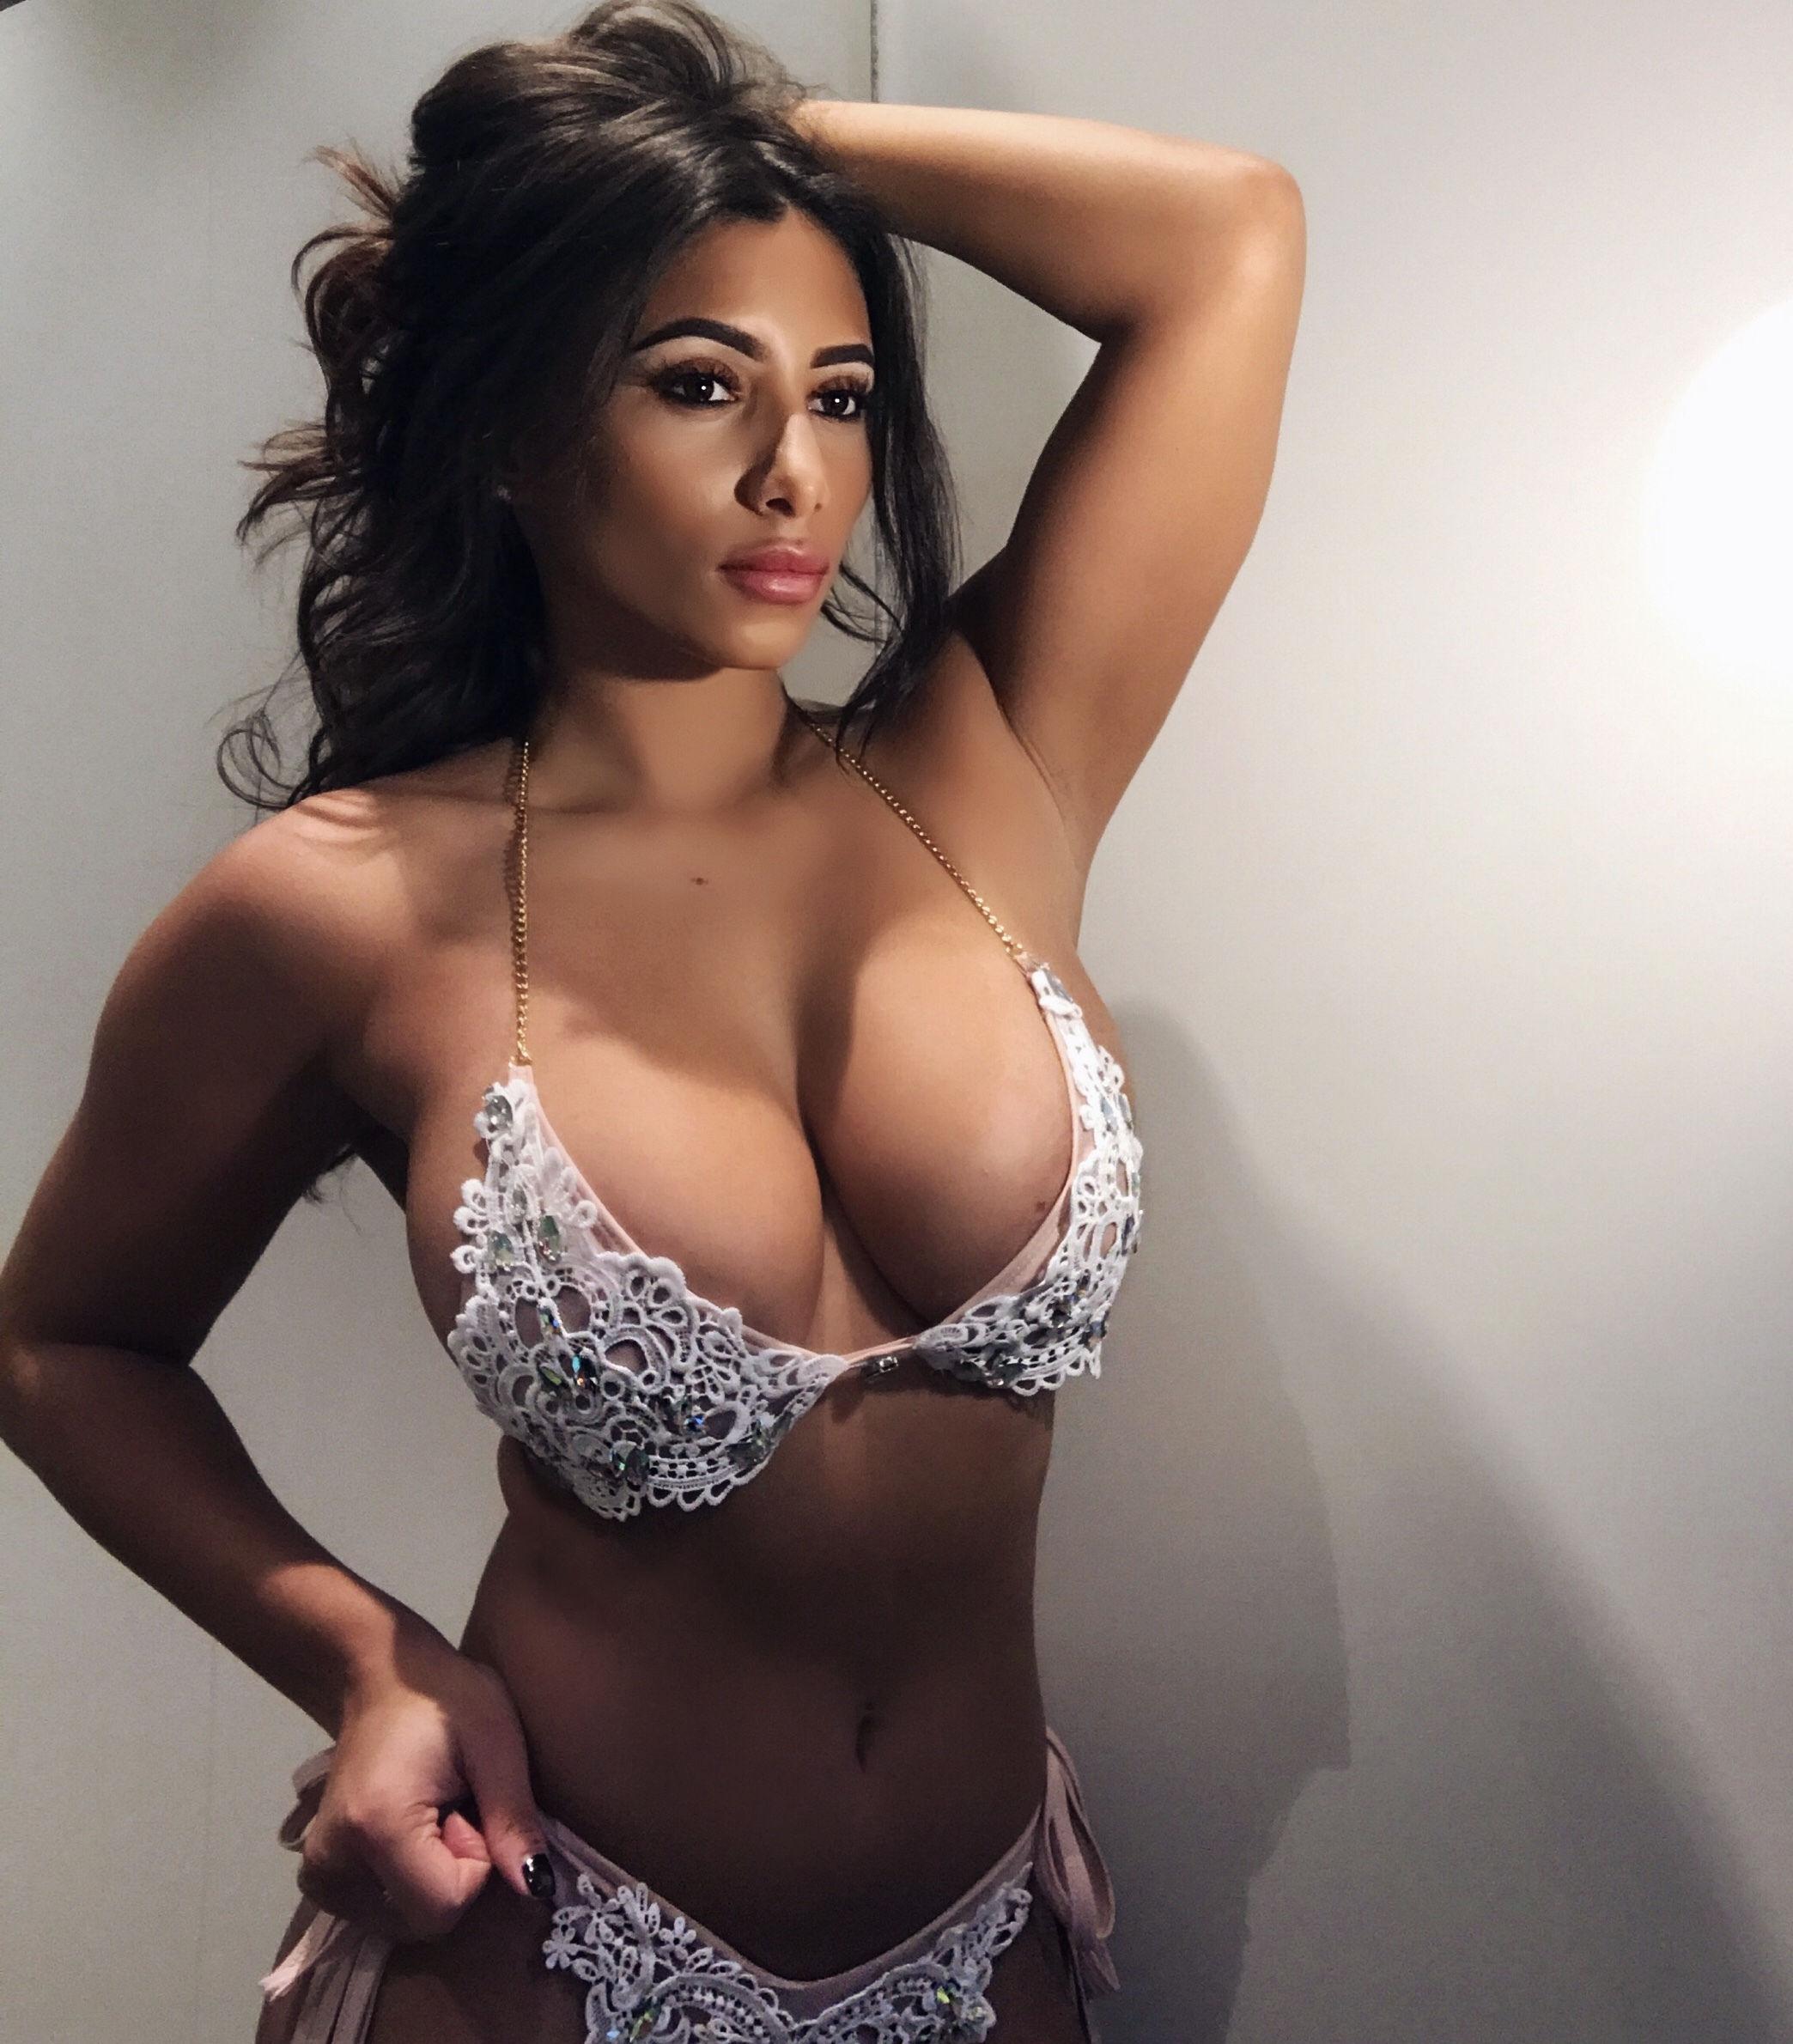 kayleigh morris nude